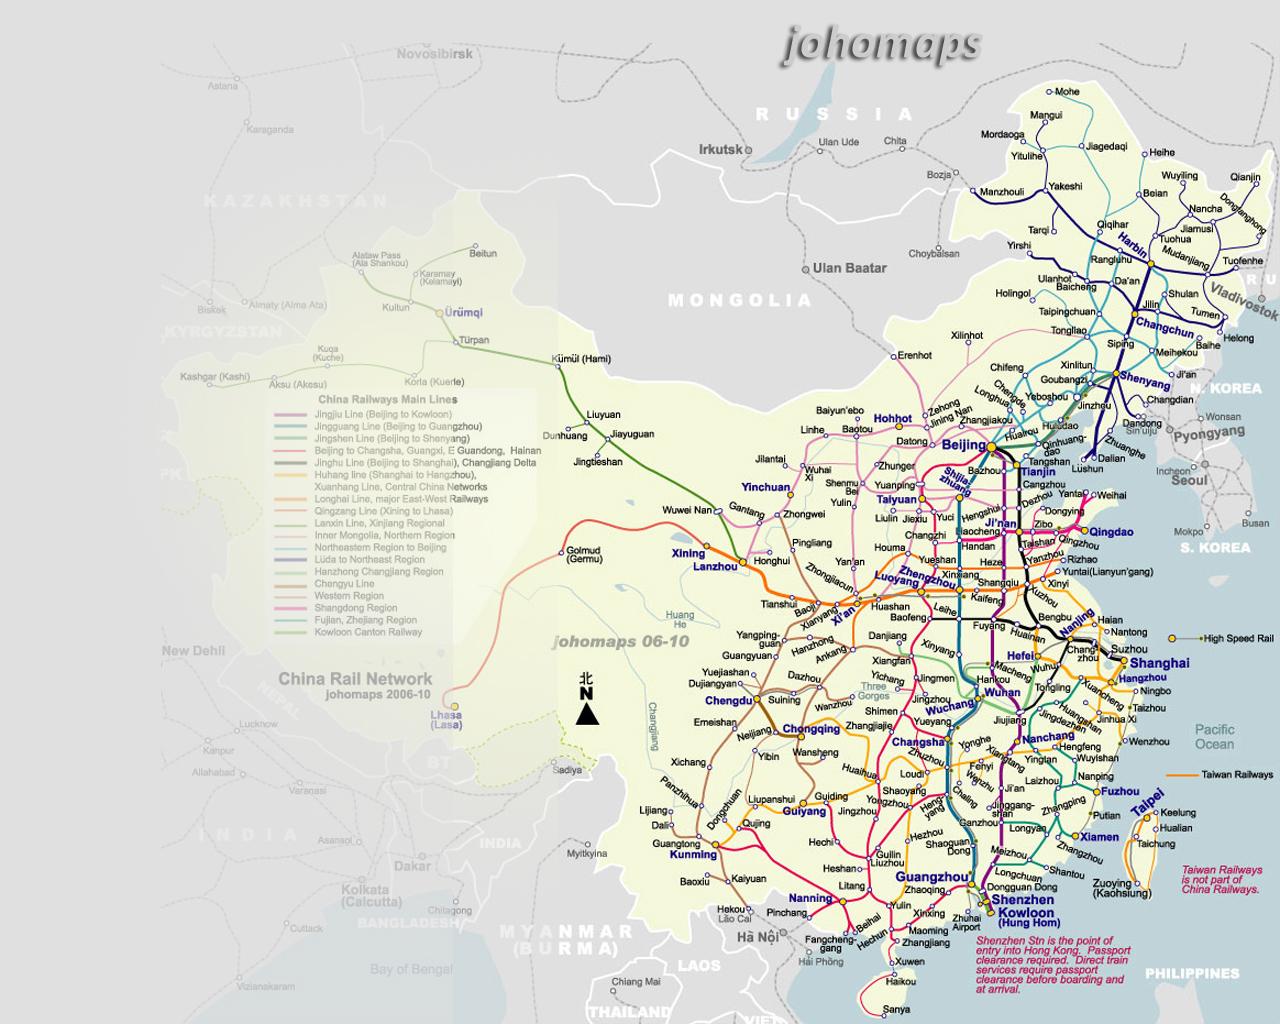 China Rail Map Mobile Wallpapers - JohoMaps